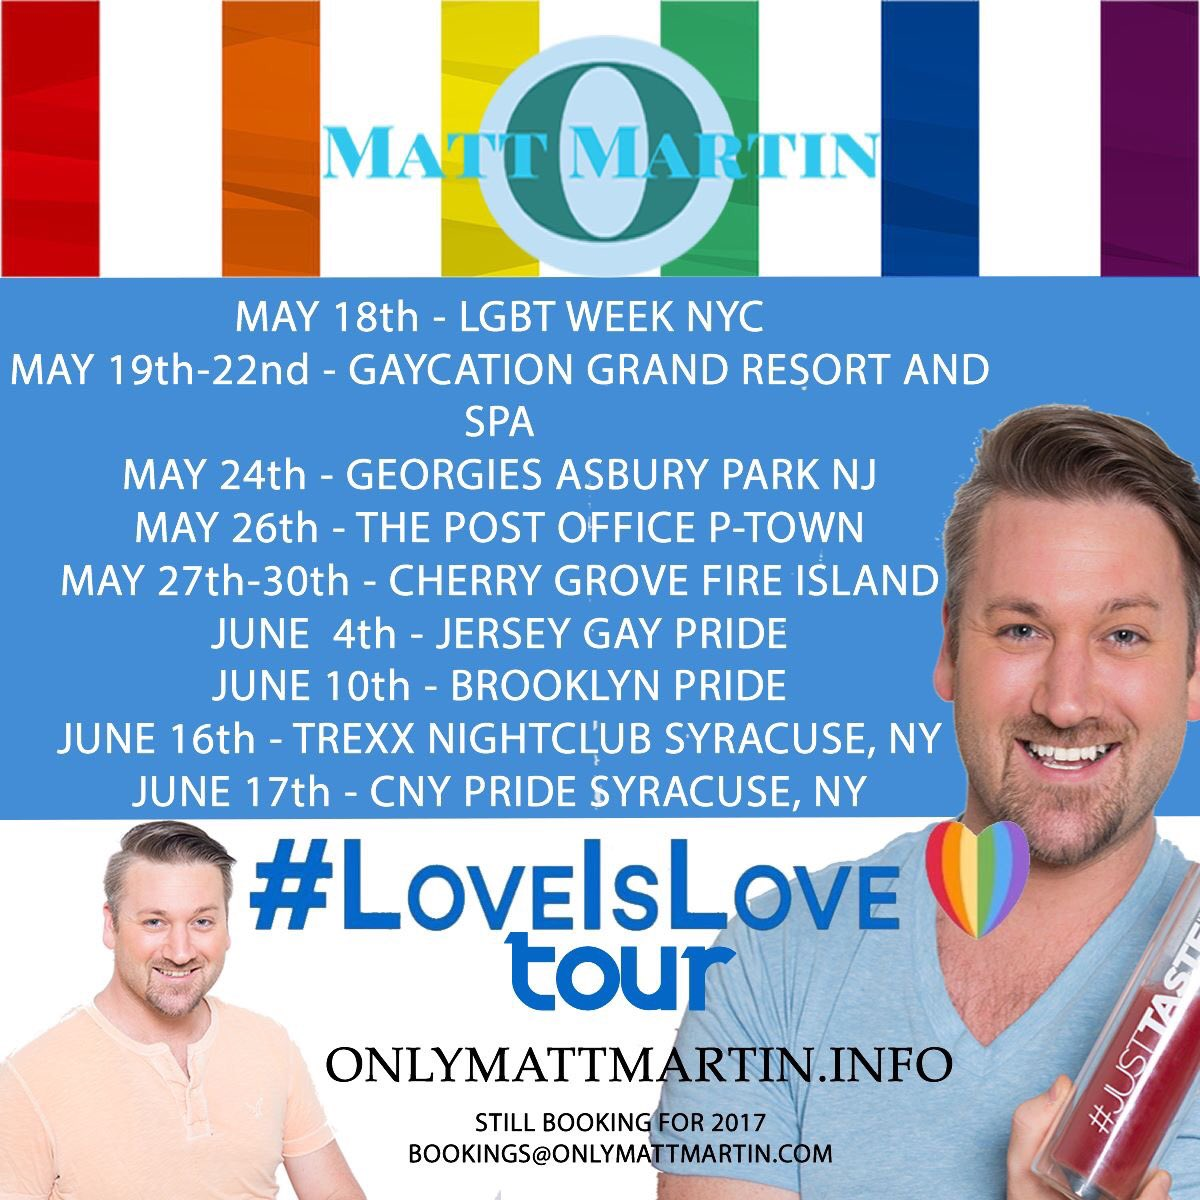 East Coast #LoveIsLove Tour Dates! https://t.co/8lavFh2rKa